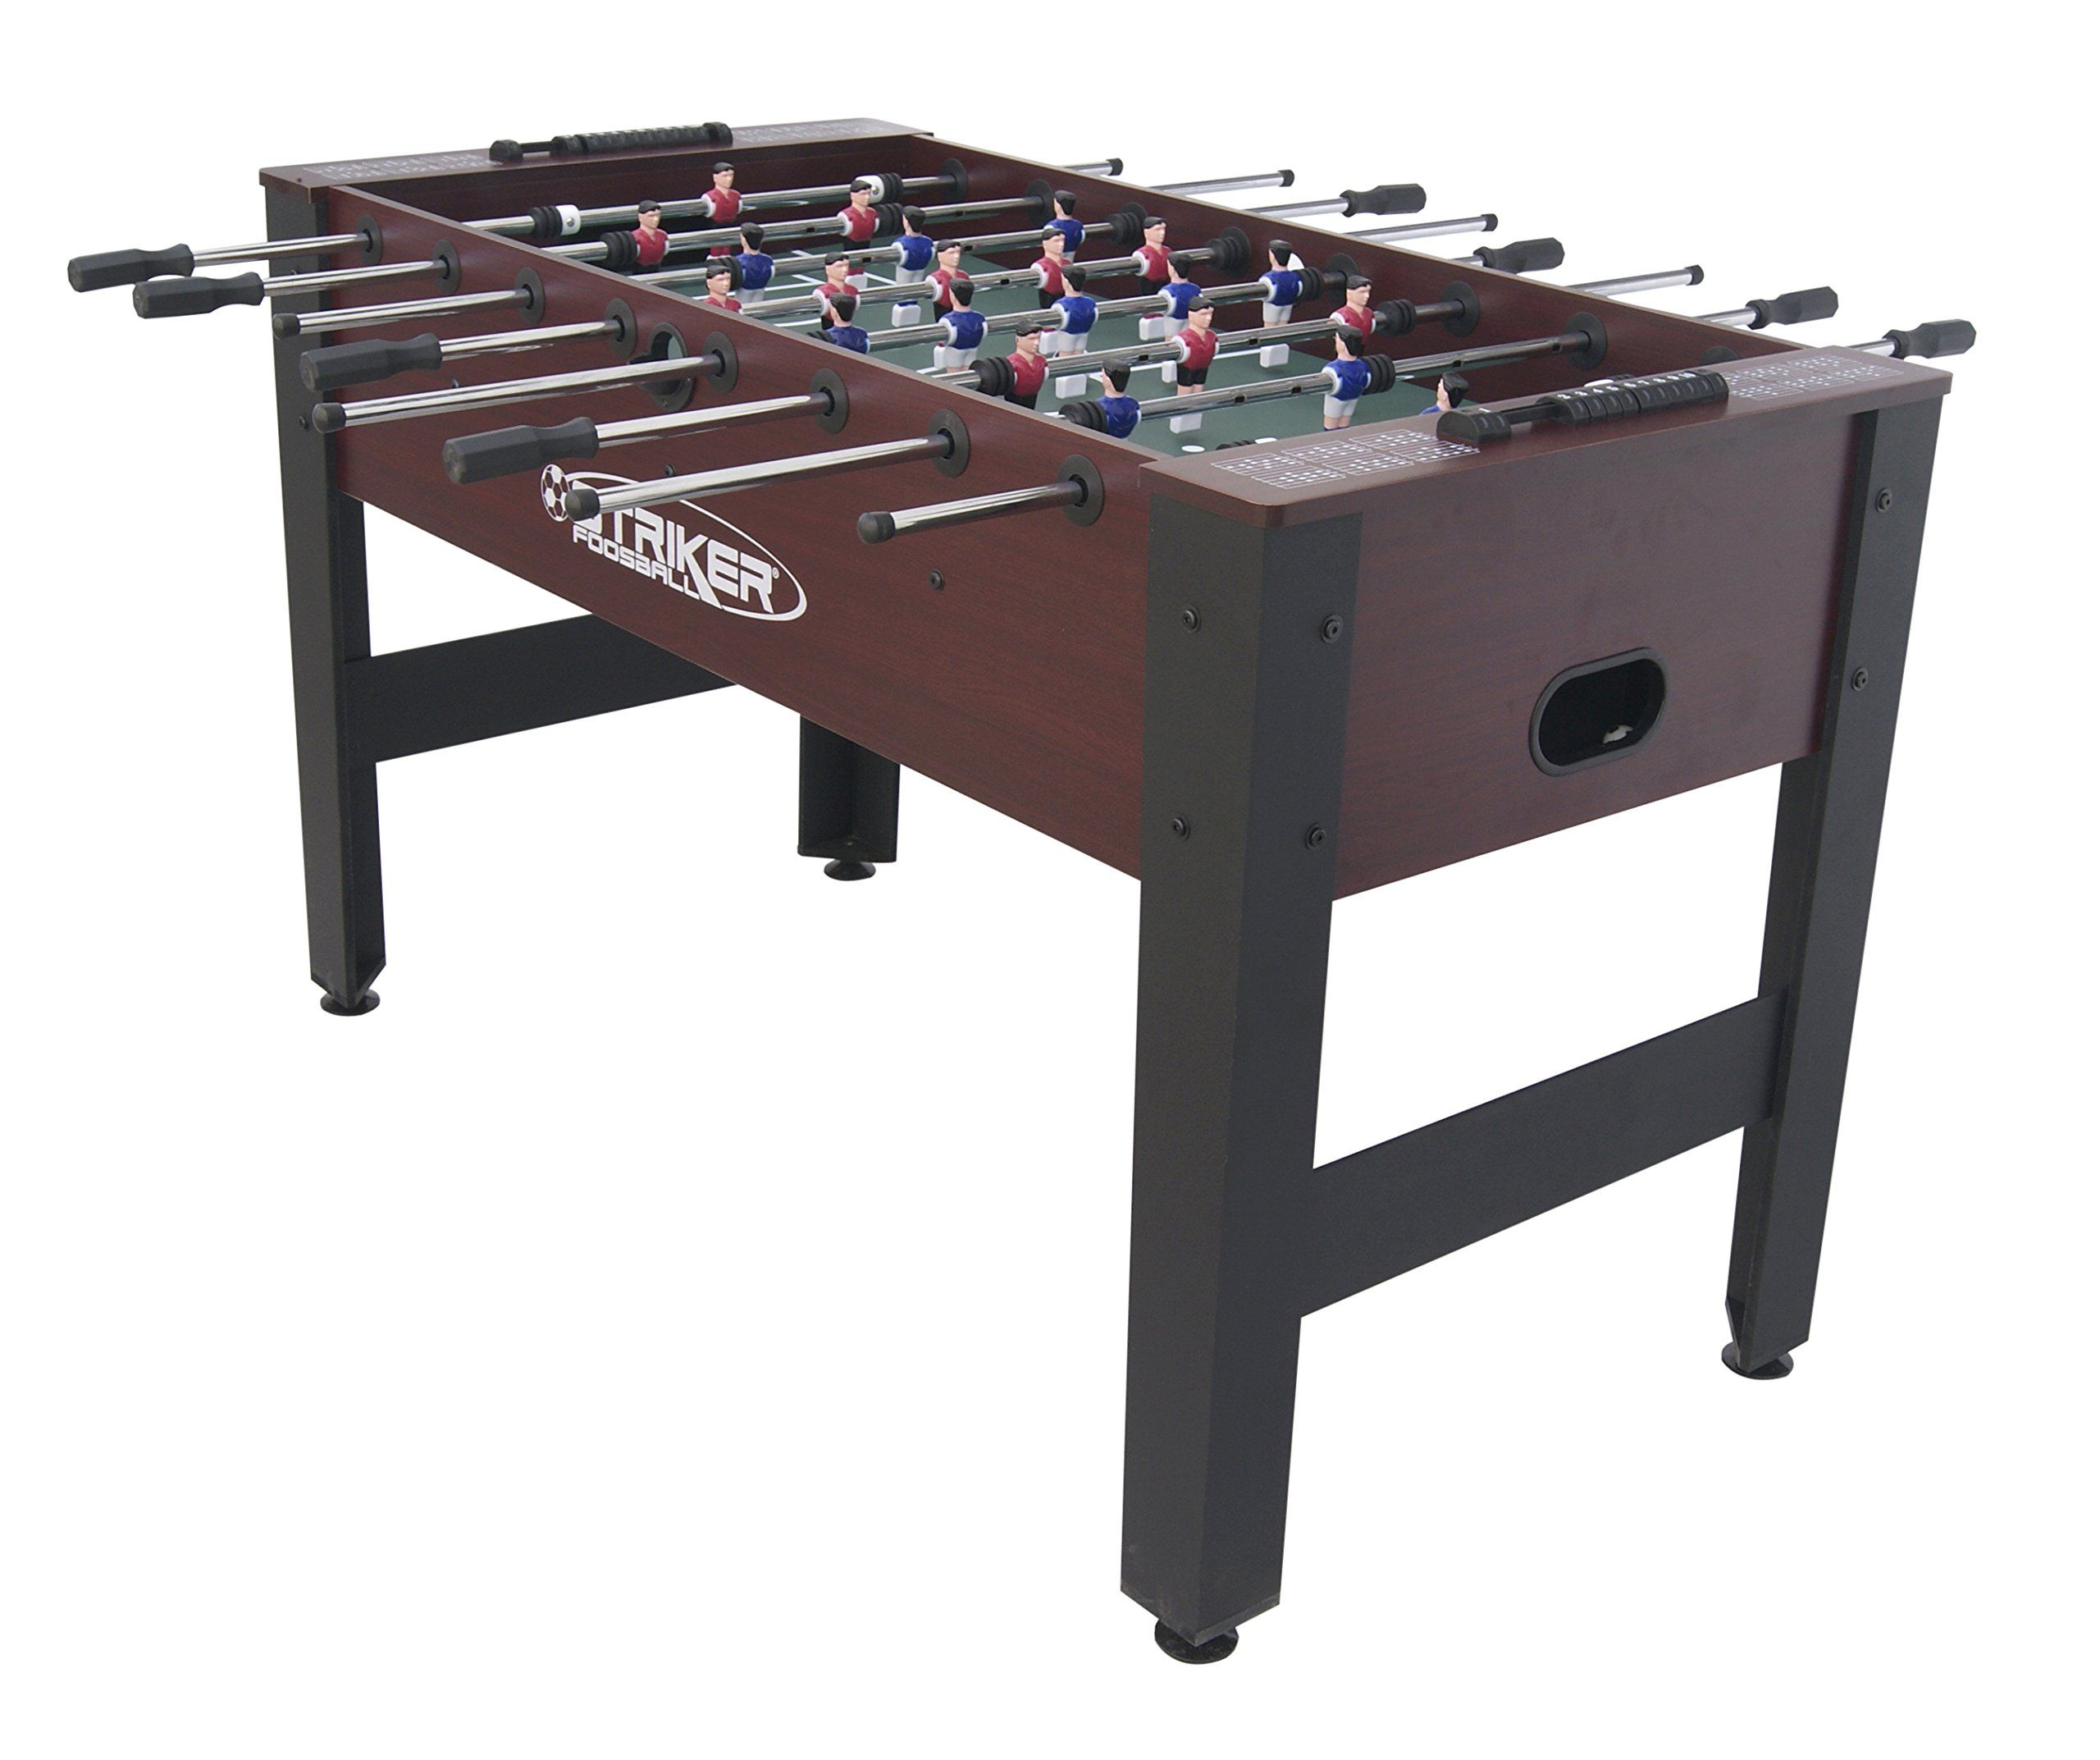 Robot Check Best Foosball Table Foosball Table Foosball